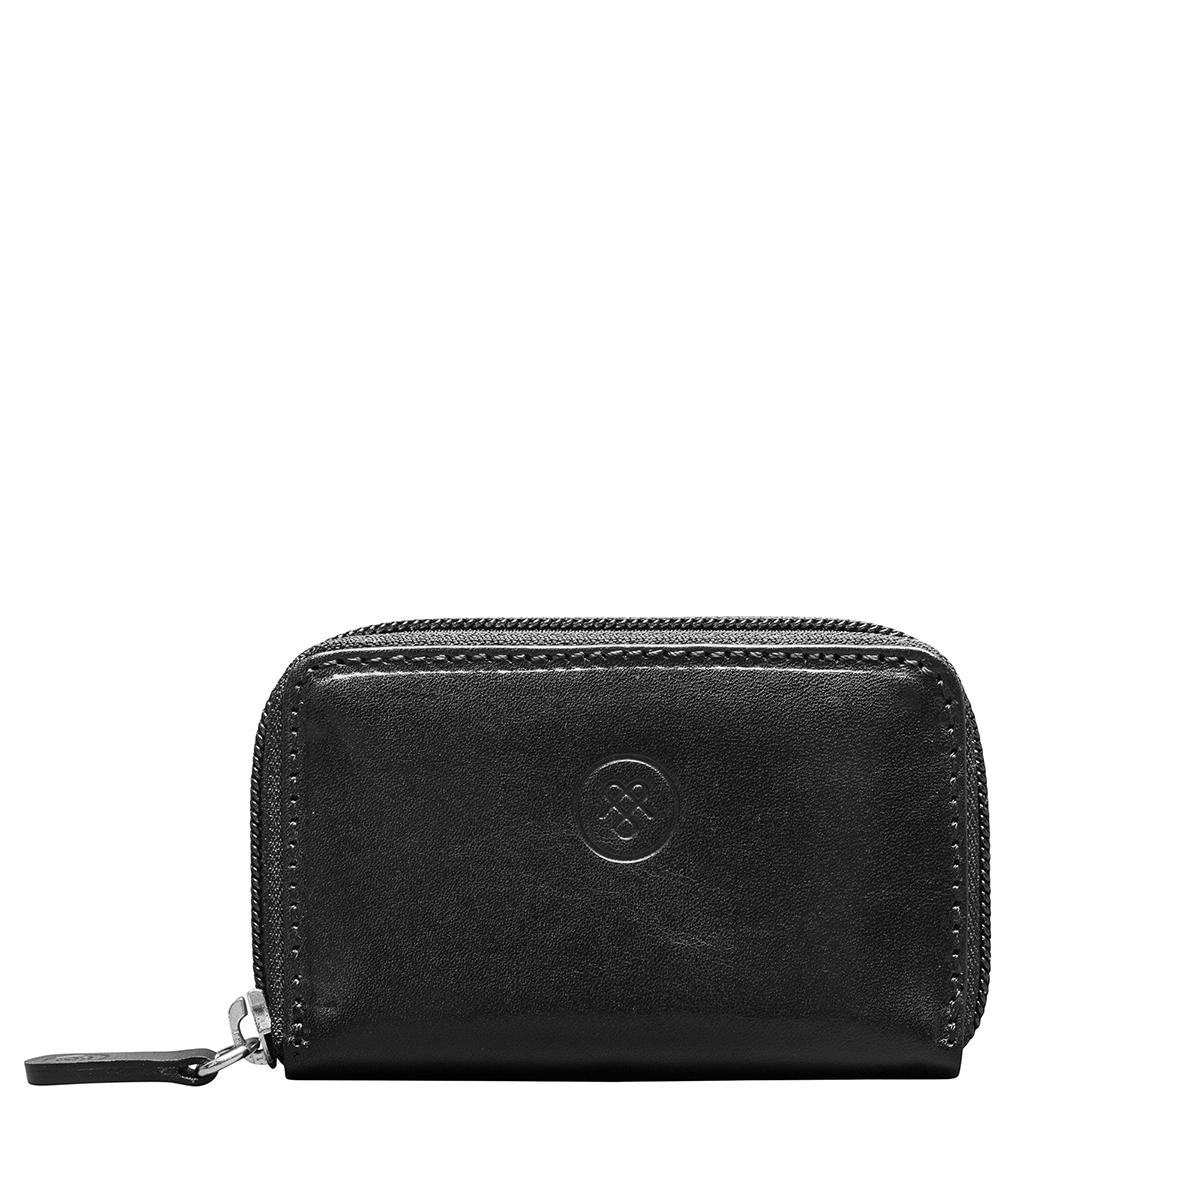 MAXWELL SCOTT BAGS Slim Black Full Grain Leather Key Case